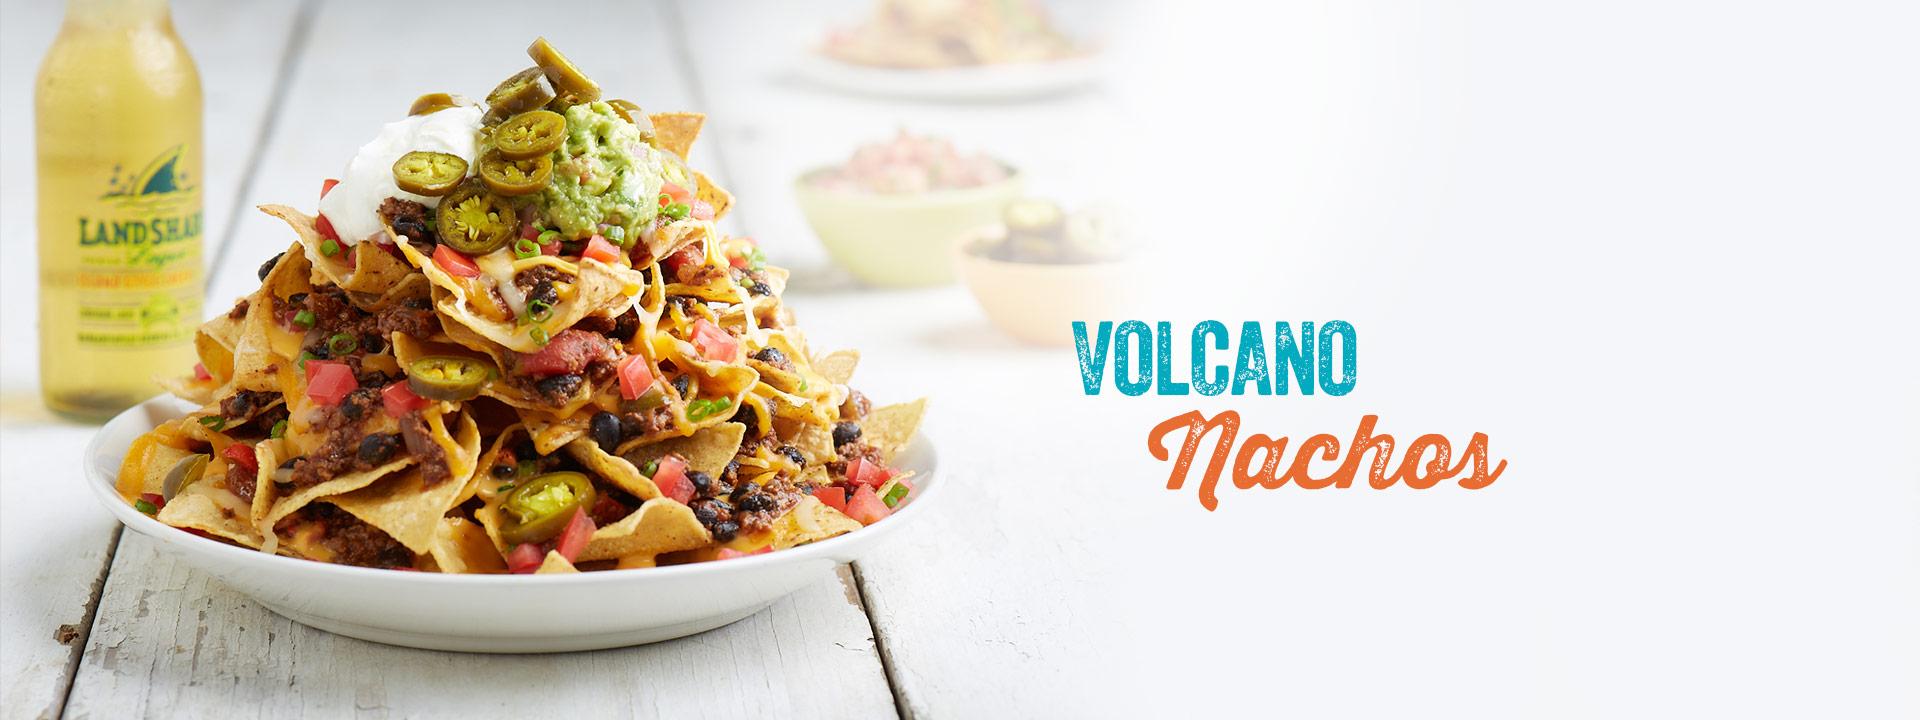 slide_volcano_nachos_14071_1491872789.jpg